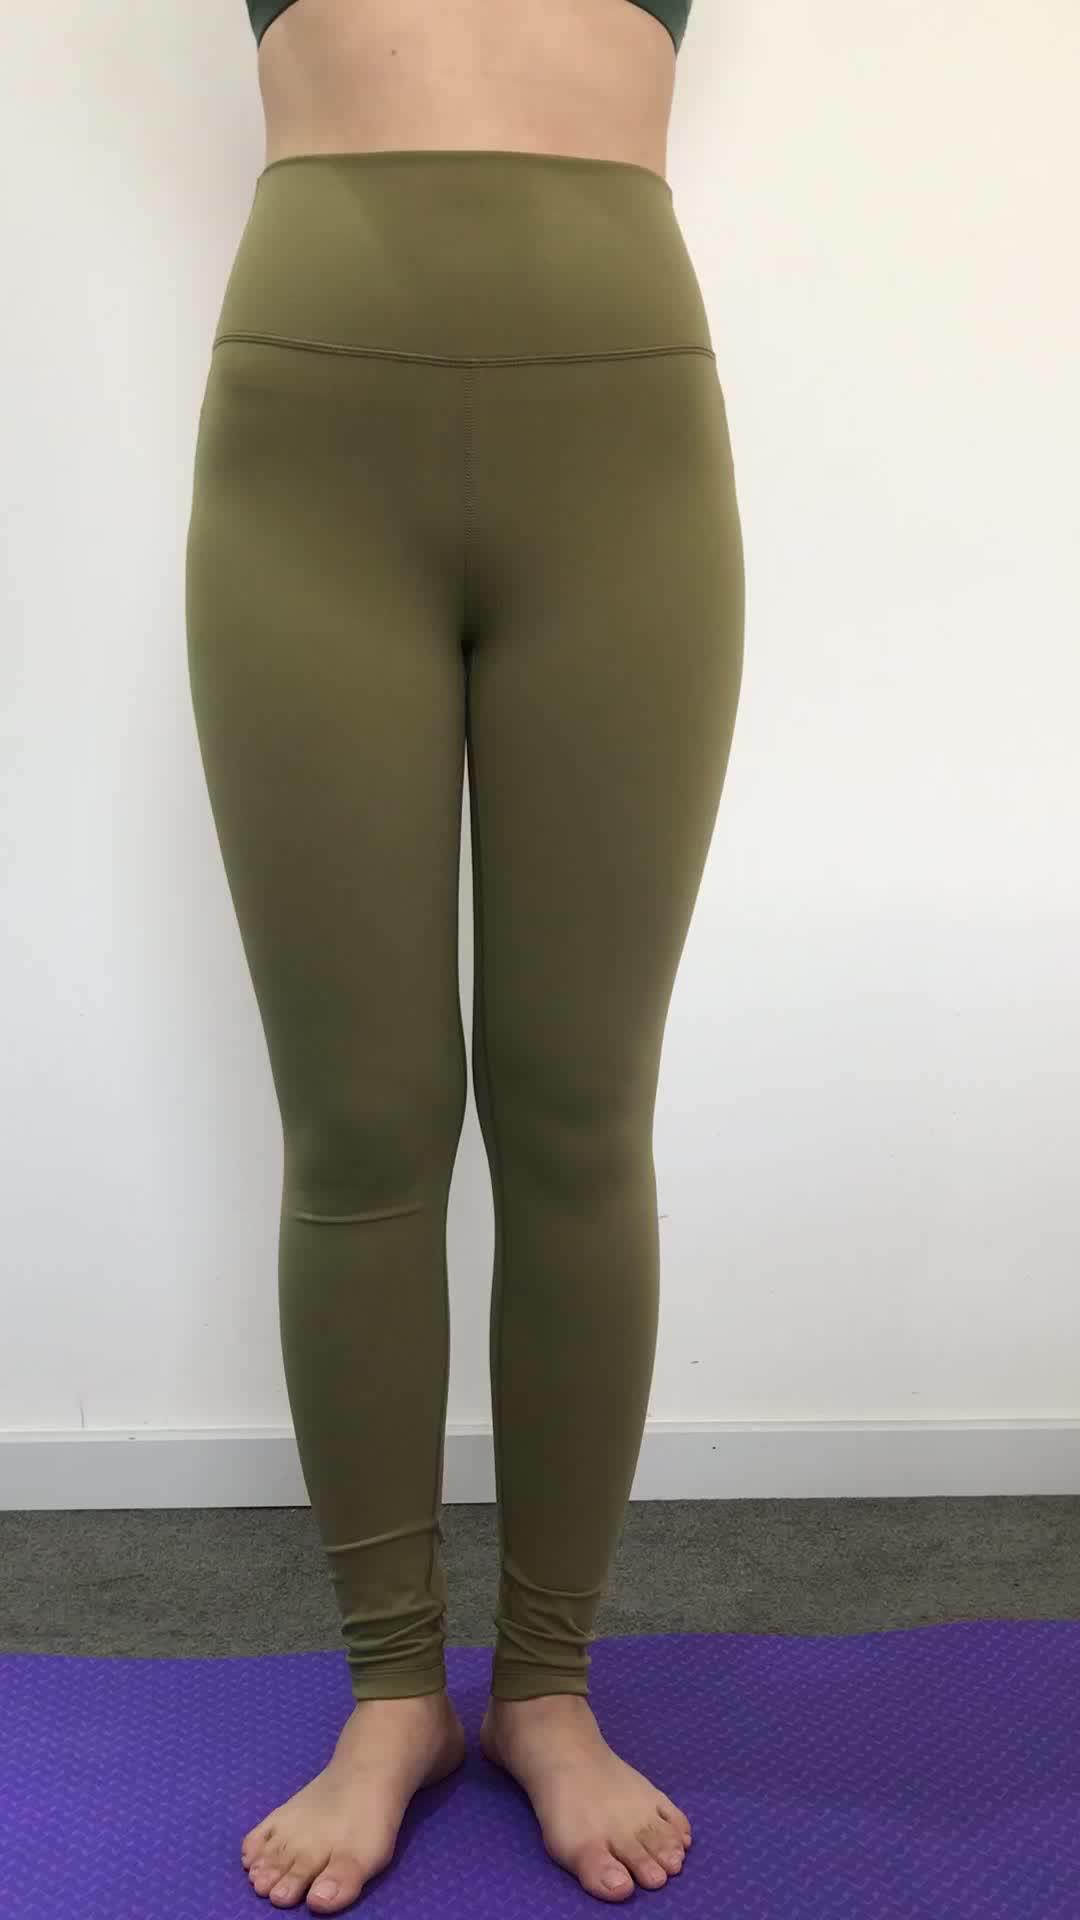 Bulk Cheap Ladies Girls Workout Scrunch Butt Lift Leggings Activewear OEM Custom Gym Fitness Women Yoga Pants